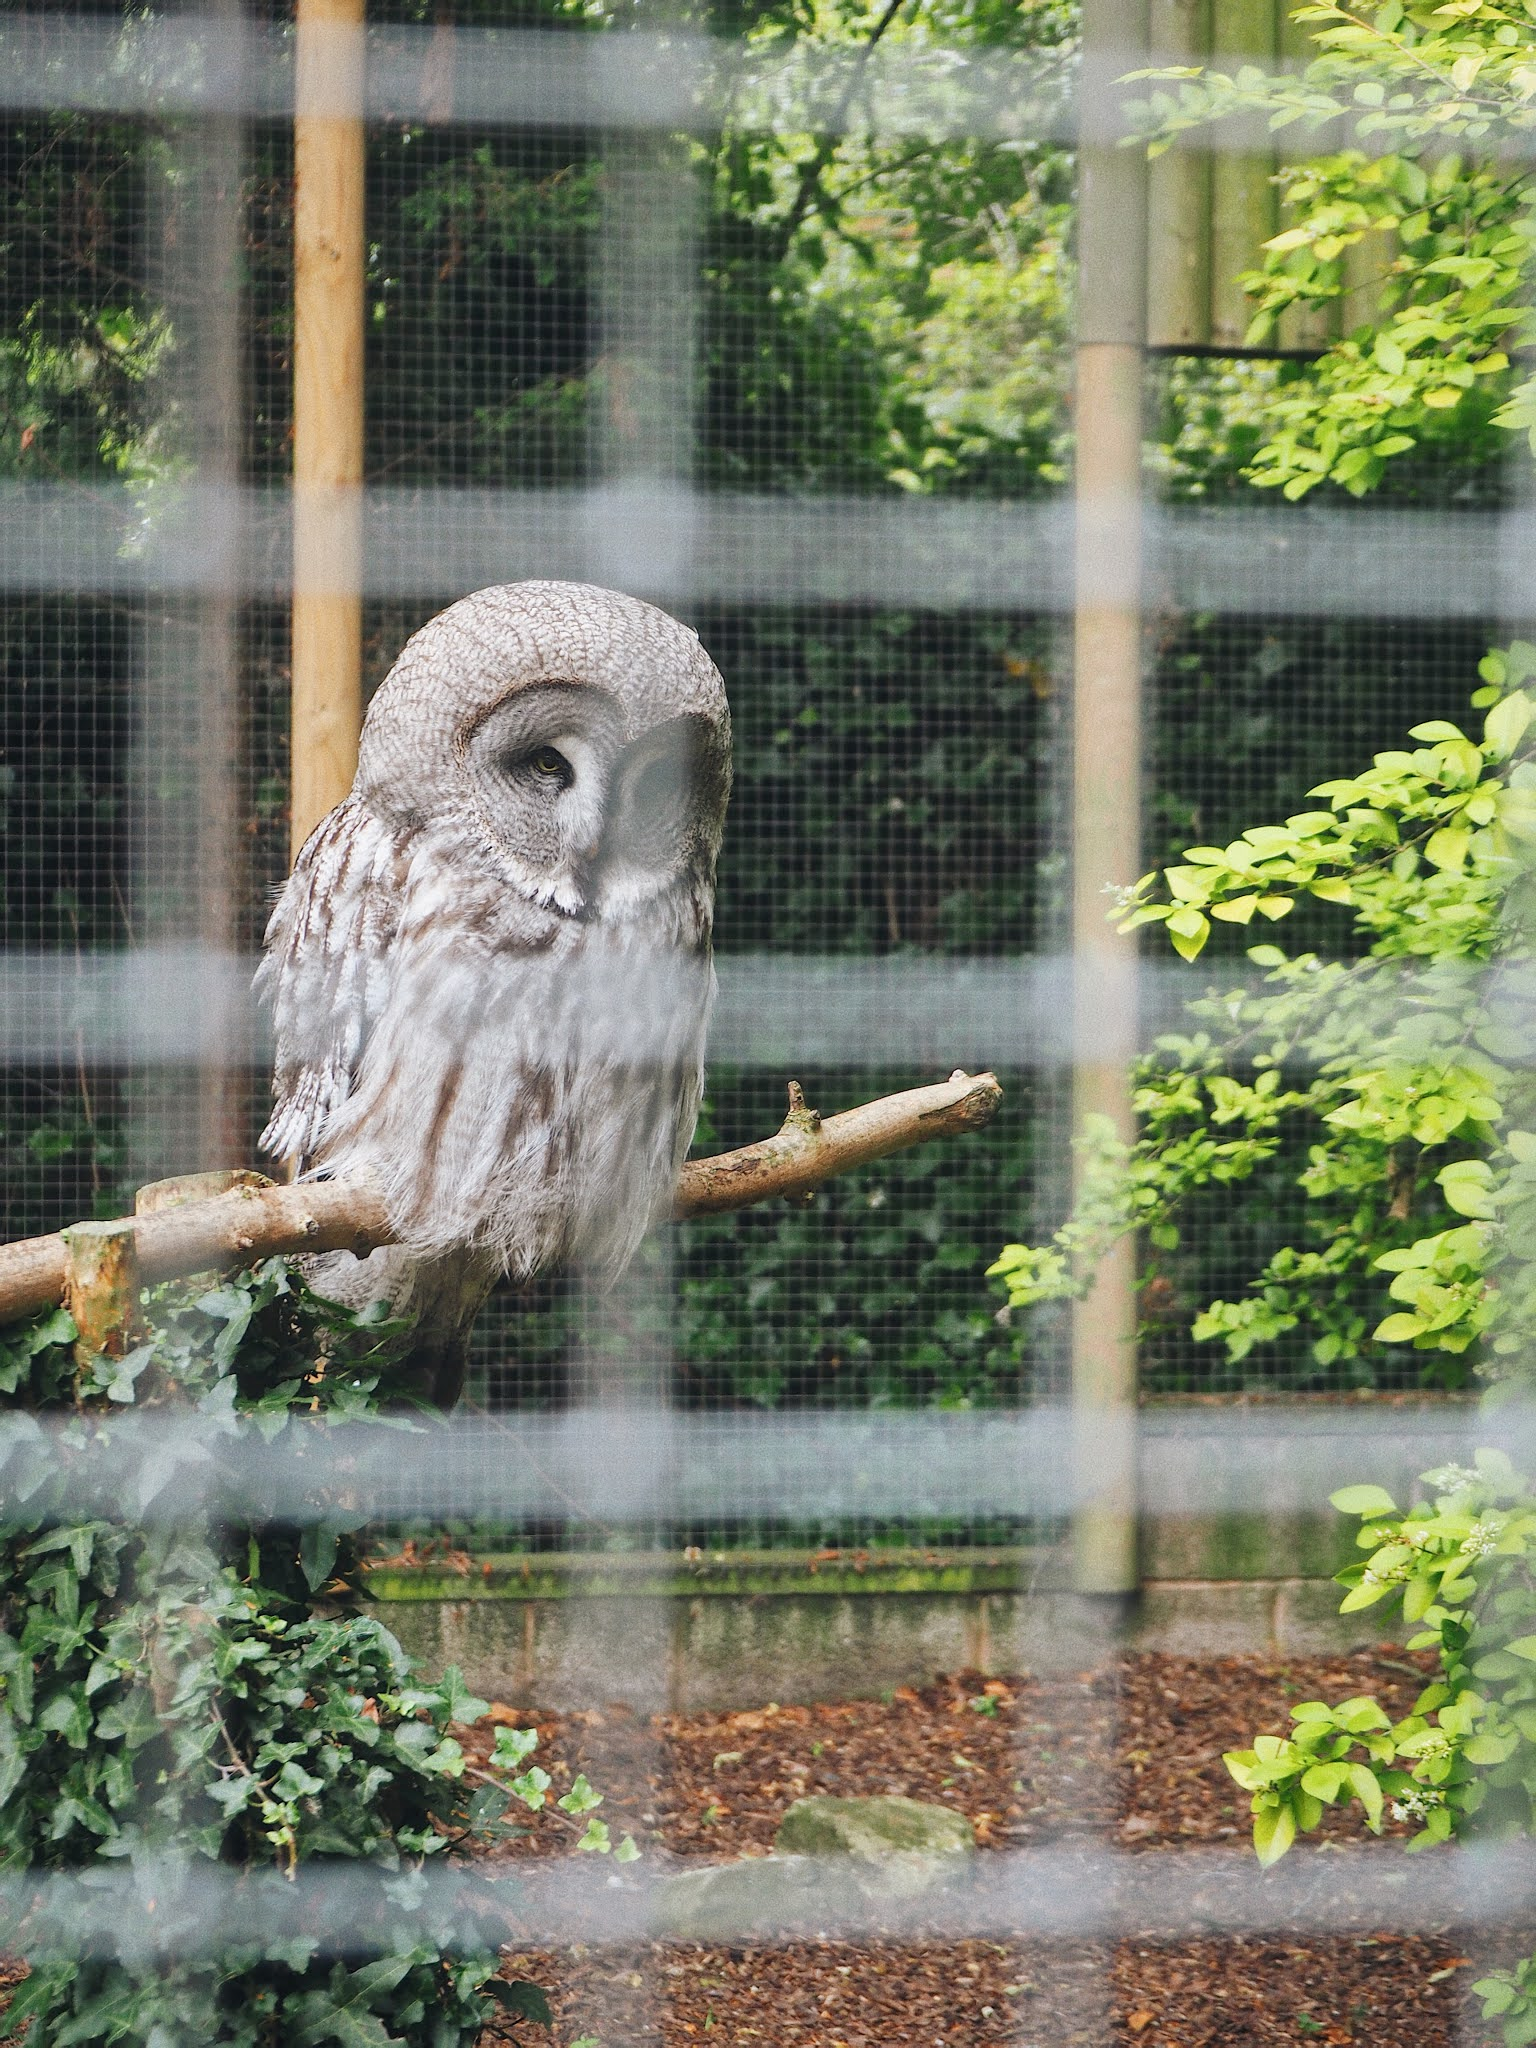 Visiting The Zoo: Post Lockdown